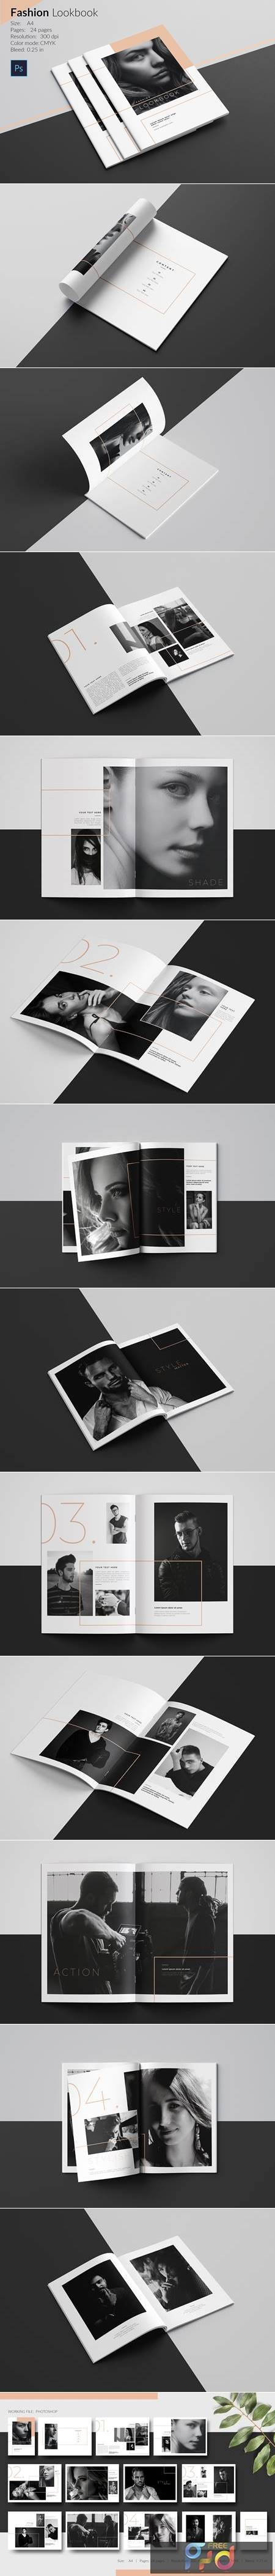 Fashion Lookbook Template 4987950 1